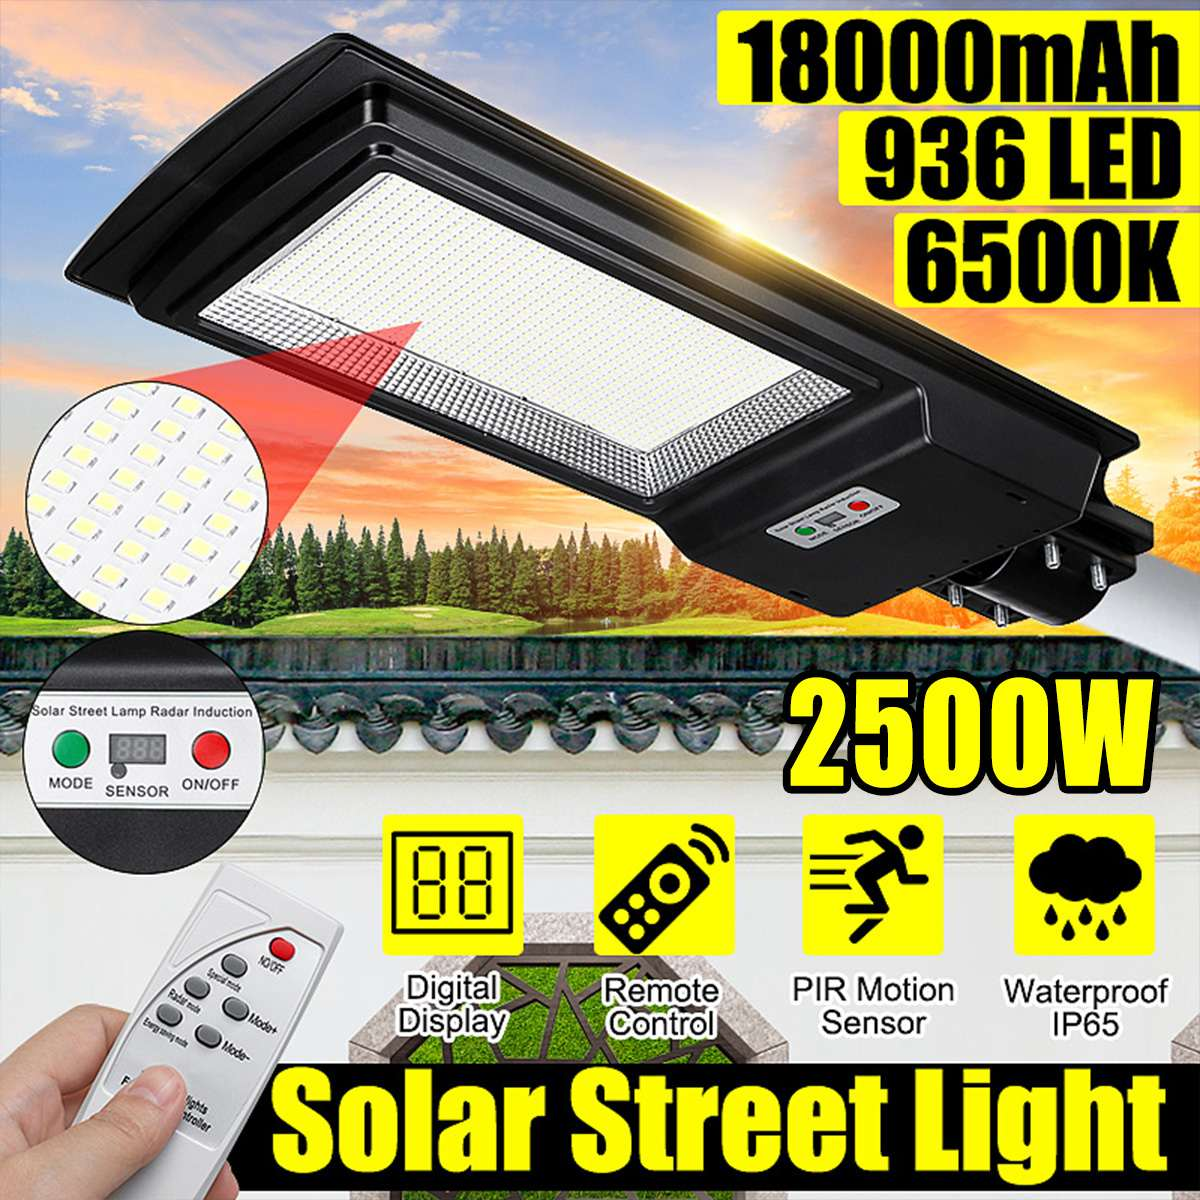 2500W Digital Display LED Solar Street Light IP65 936 LED Light Radar Motion Sensor Wall Timing Lamp+Remote For  Garden Outdoor